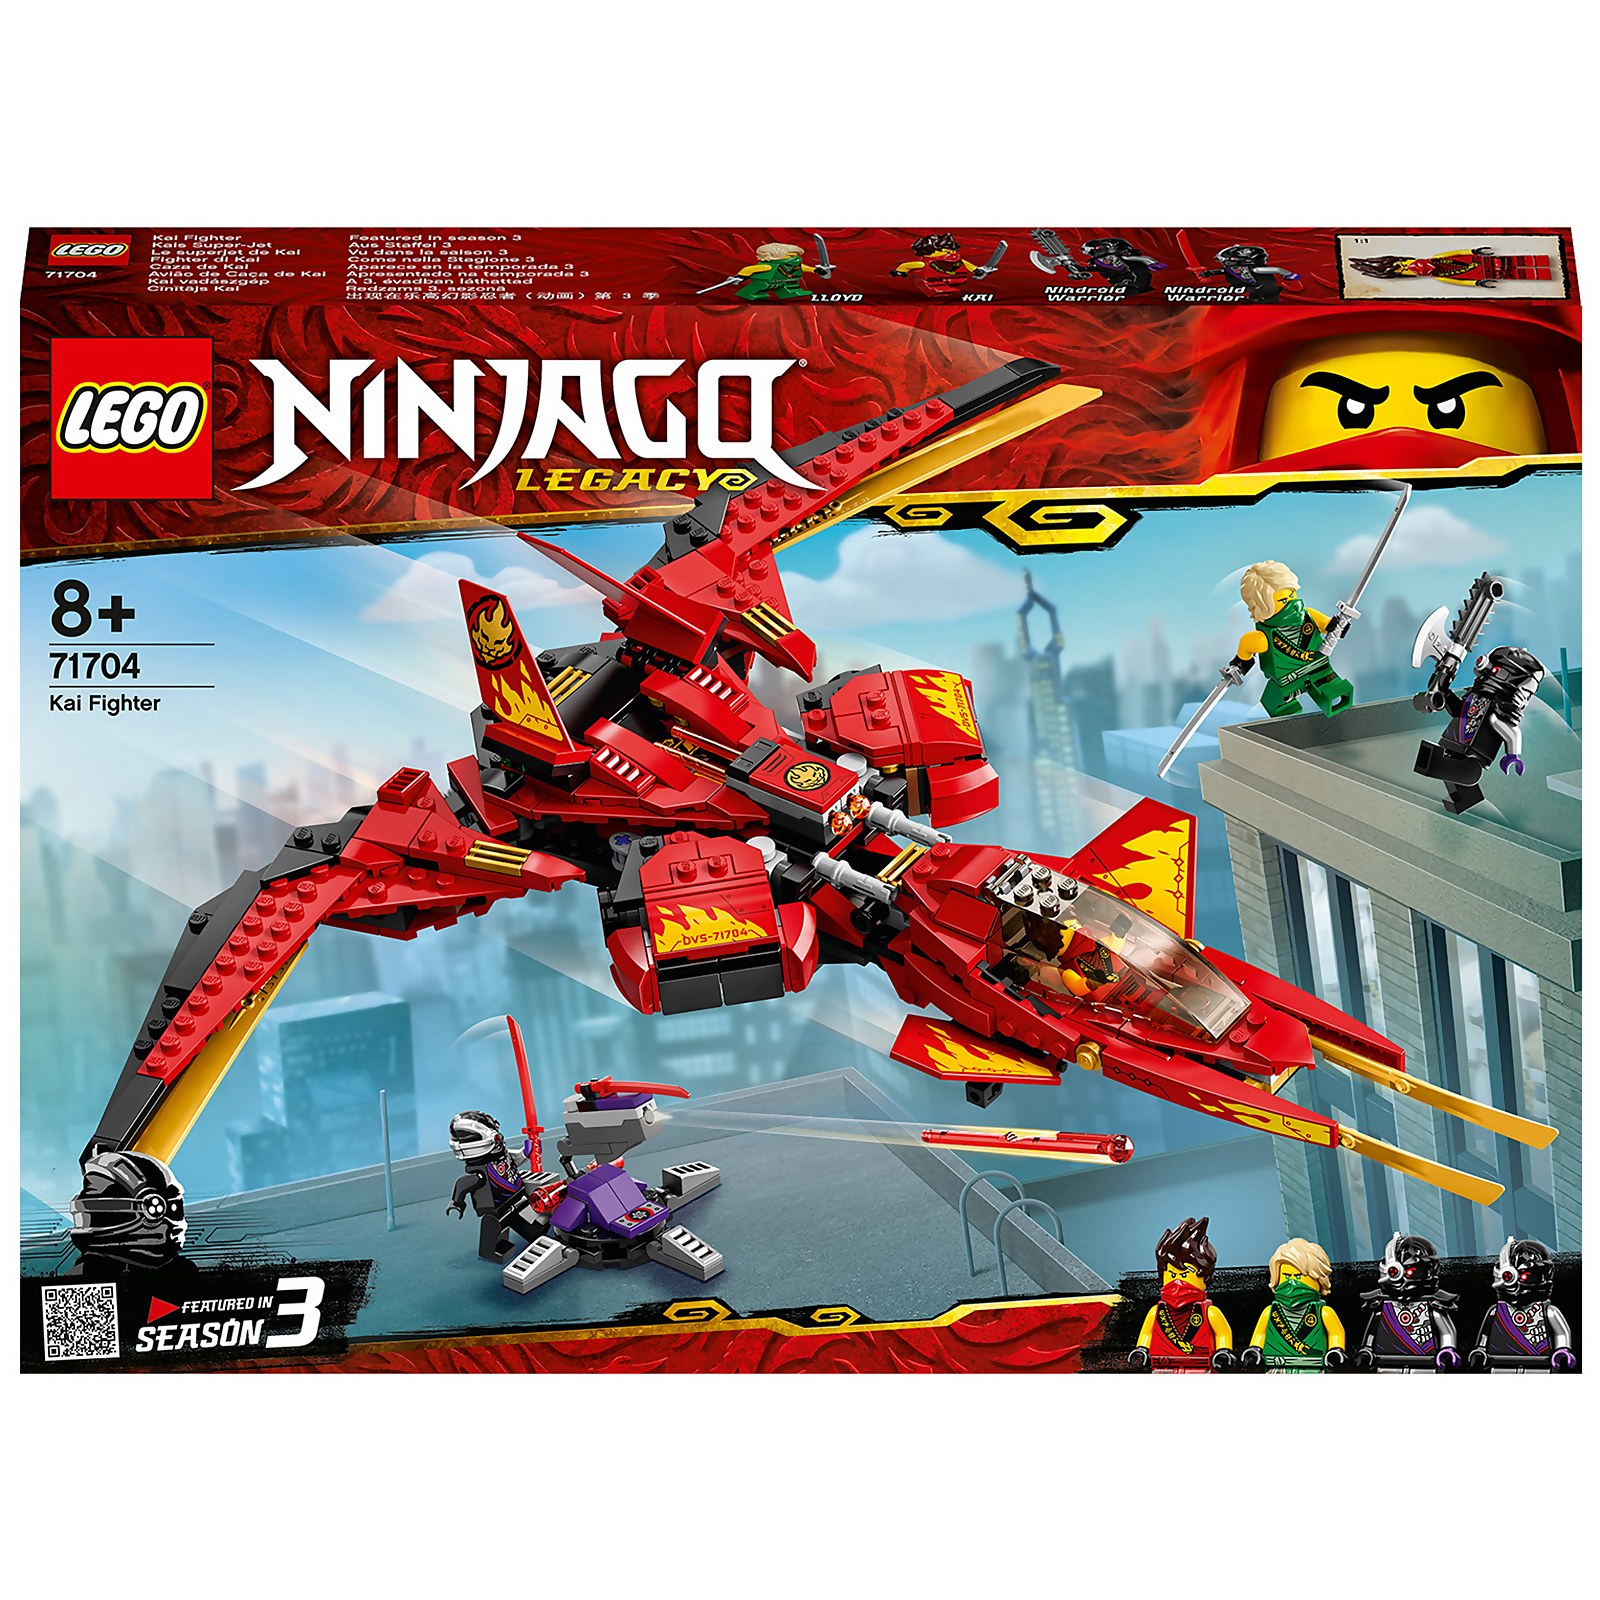 Image of 71704 LEGO® NINJAGO Kais super jet